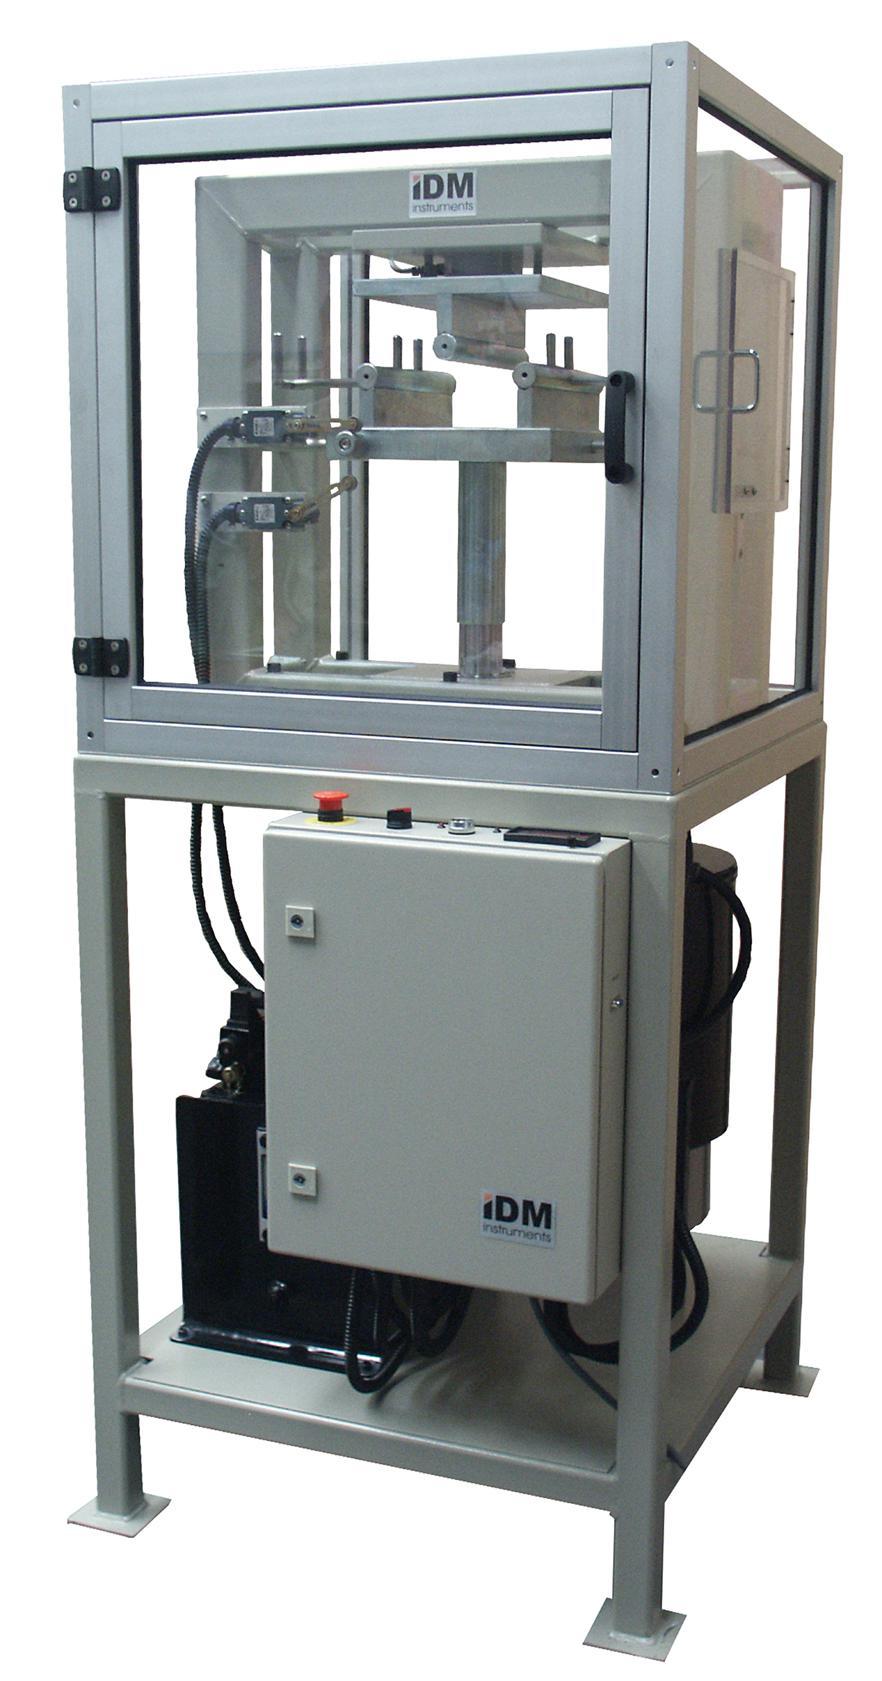 C0047 – Compression Tester, 10 Tonne 3 – Point Bend Fixture